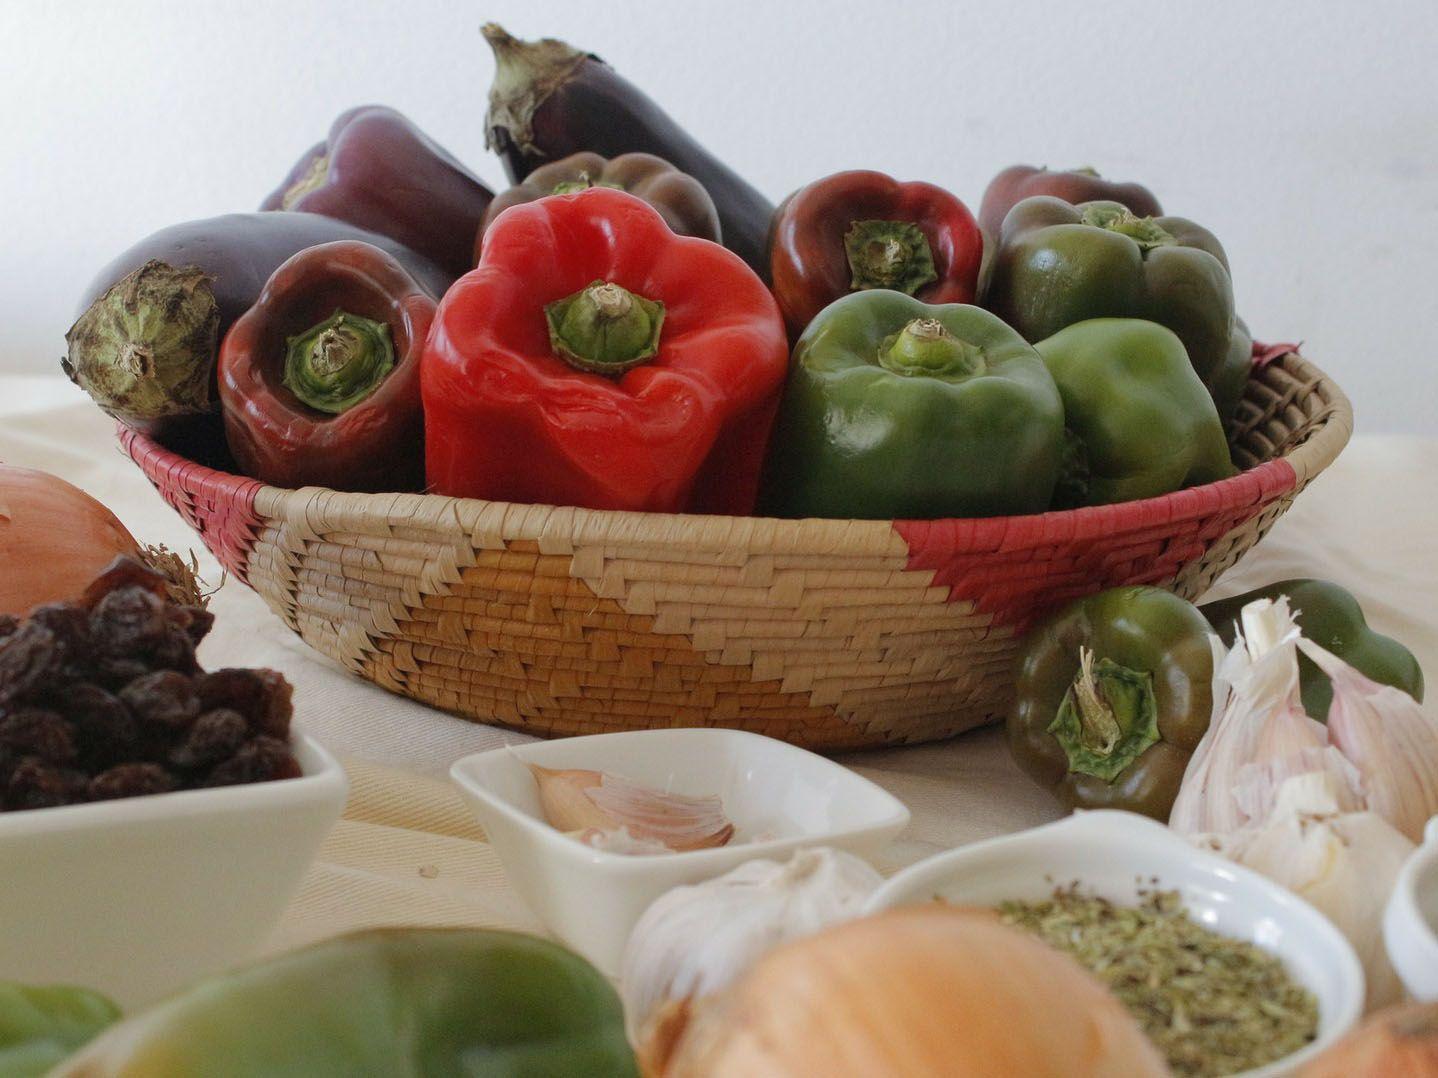 Mediterranean food, nourriture mediterranneene